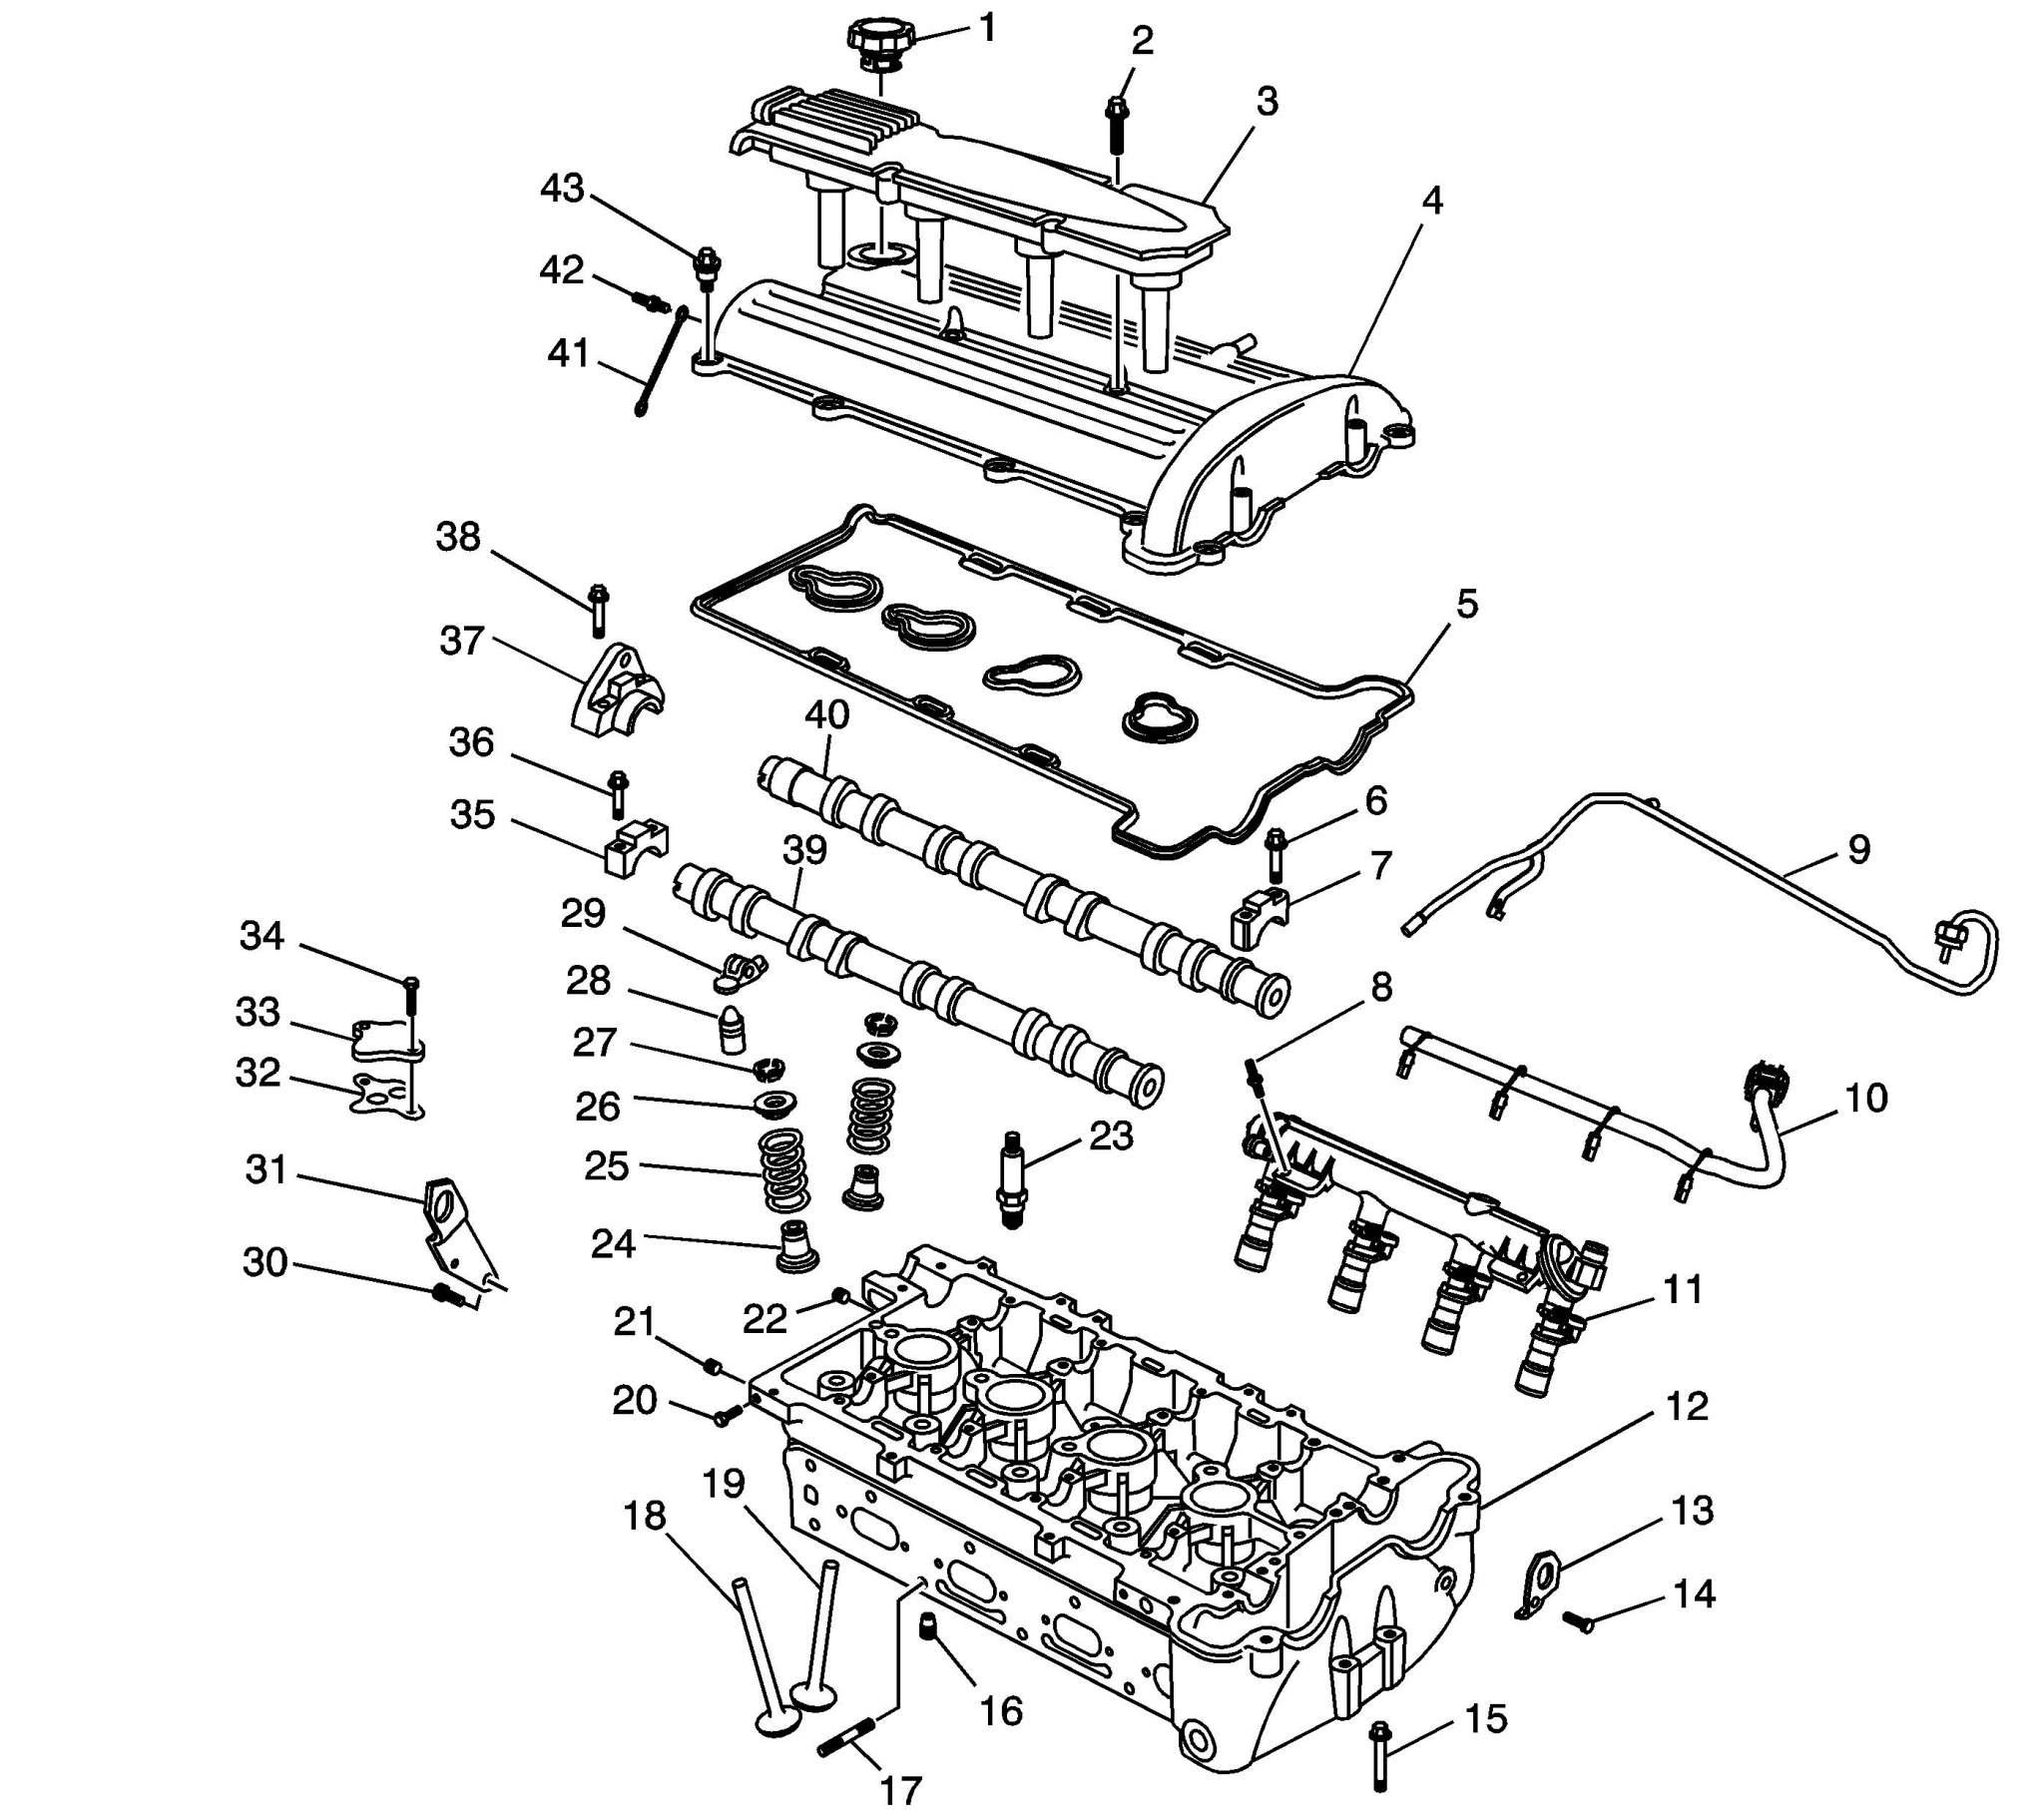 Ecotec Engine Diagram Head Reinvent Your Wiring Gm 4 2l Z22se Co Uk Rh 14 Turbo